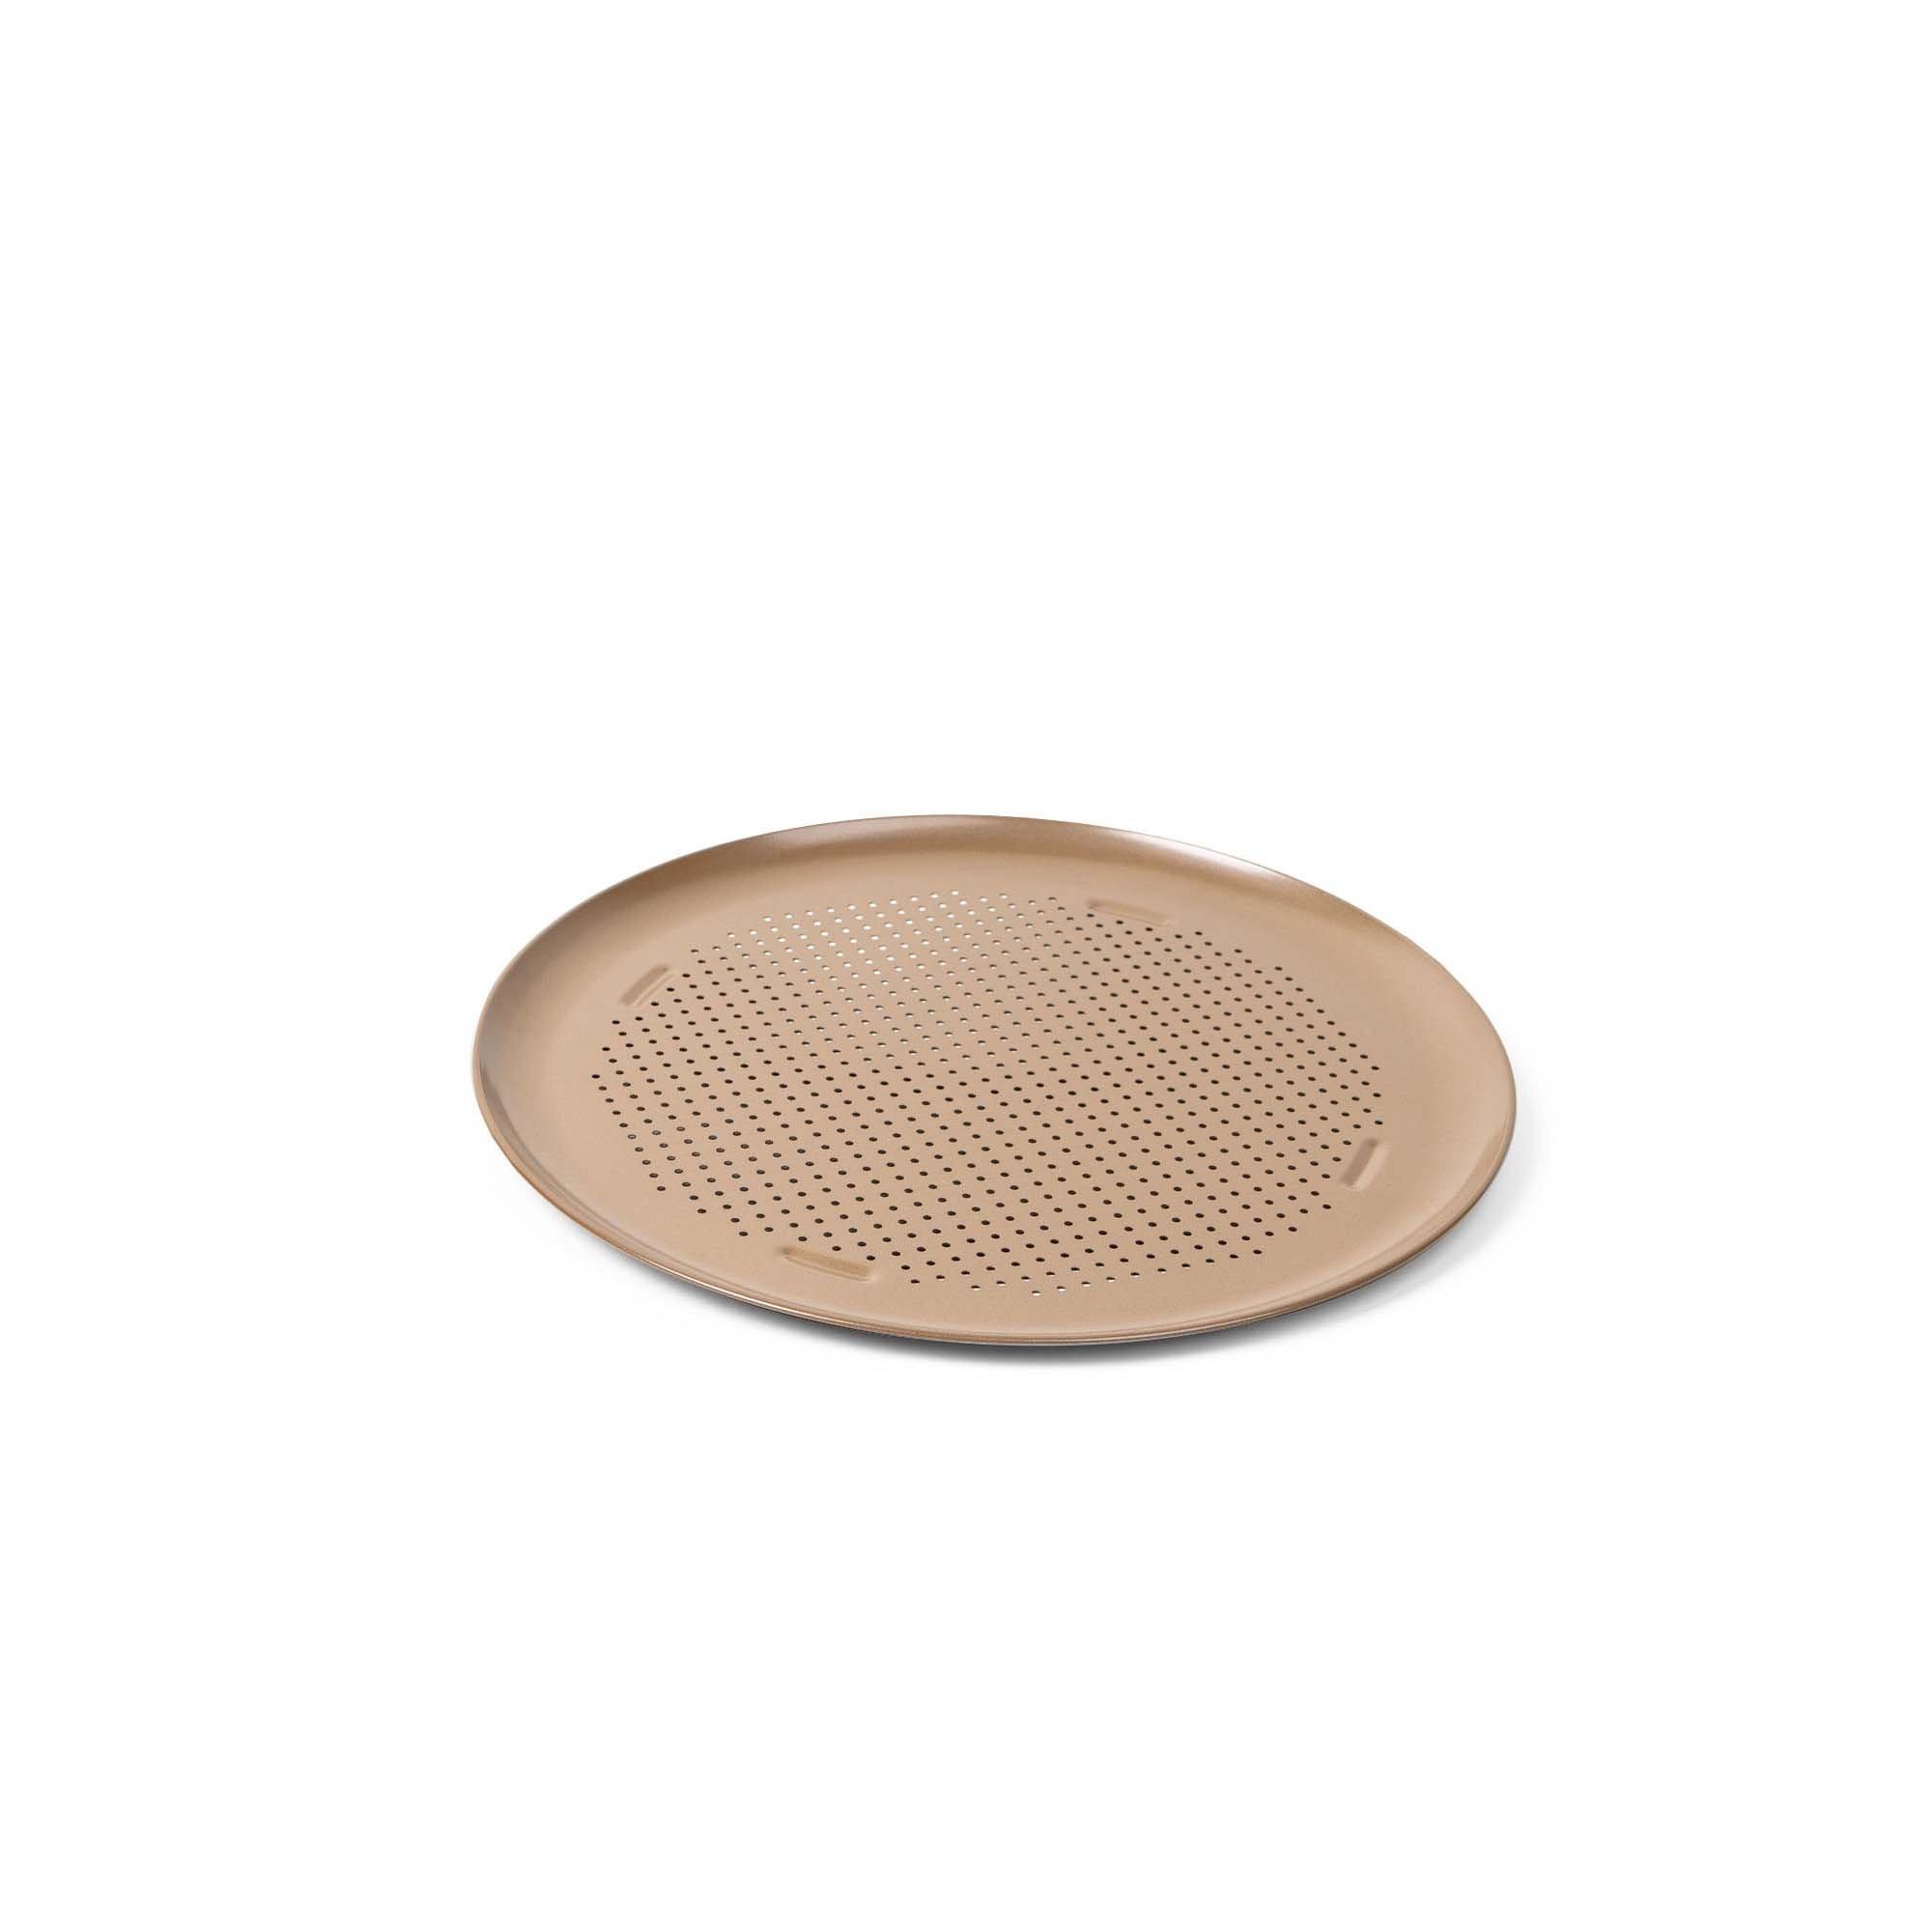 Calphalon Nonstick Bakeware Pizza Pan, 16'', Toffee - 1893302